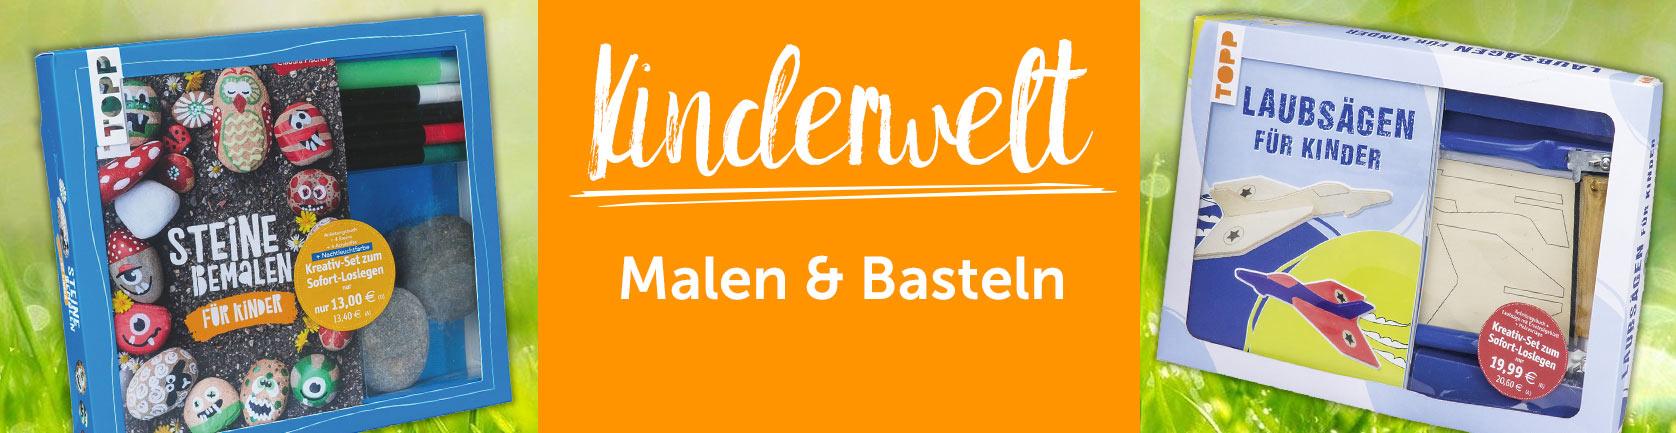 Malen & Basteln